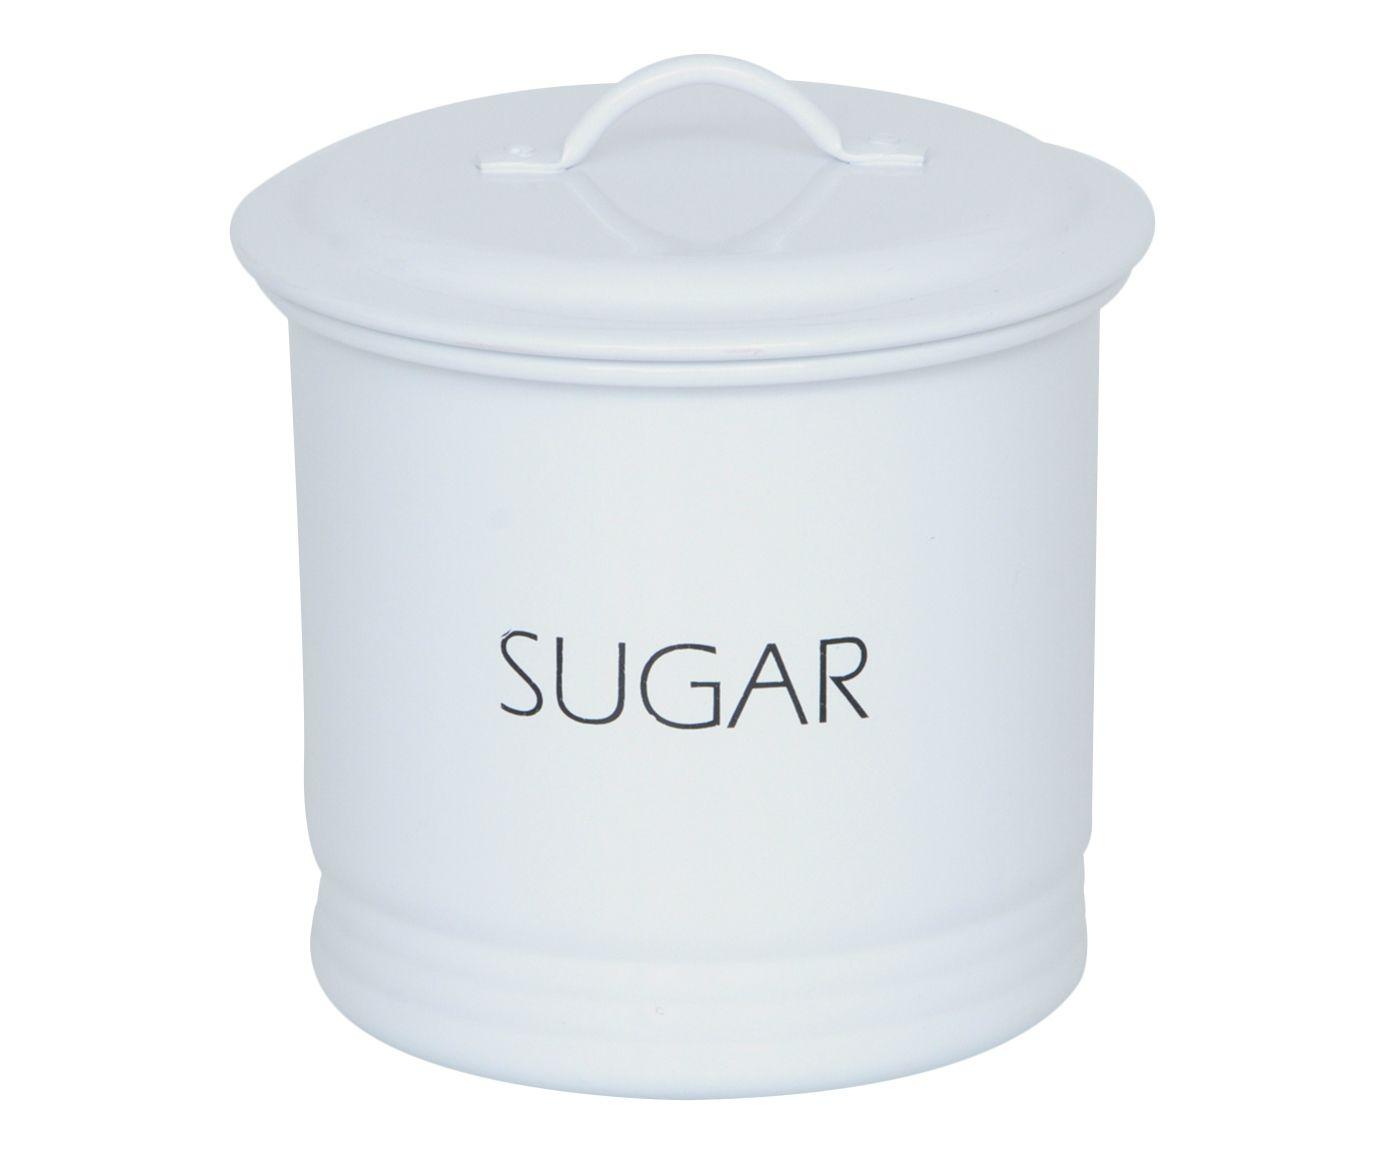 Lata Canelada Sugar - Branca | Westwing.com.br